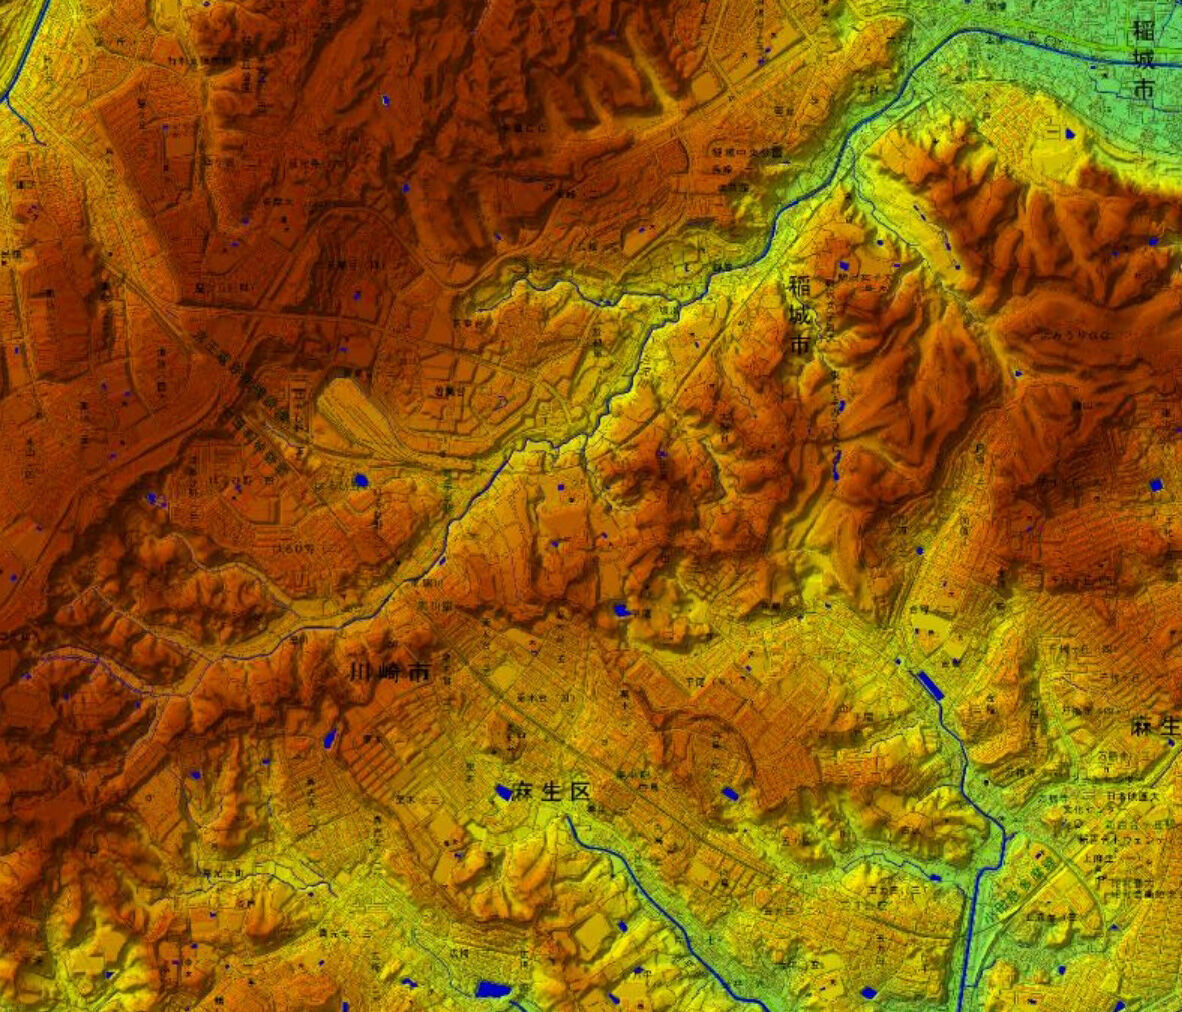 黒川地形図1100